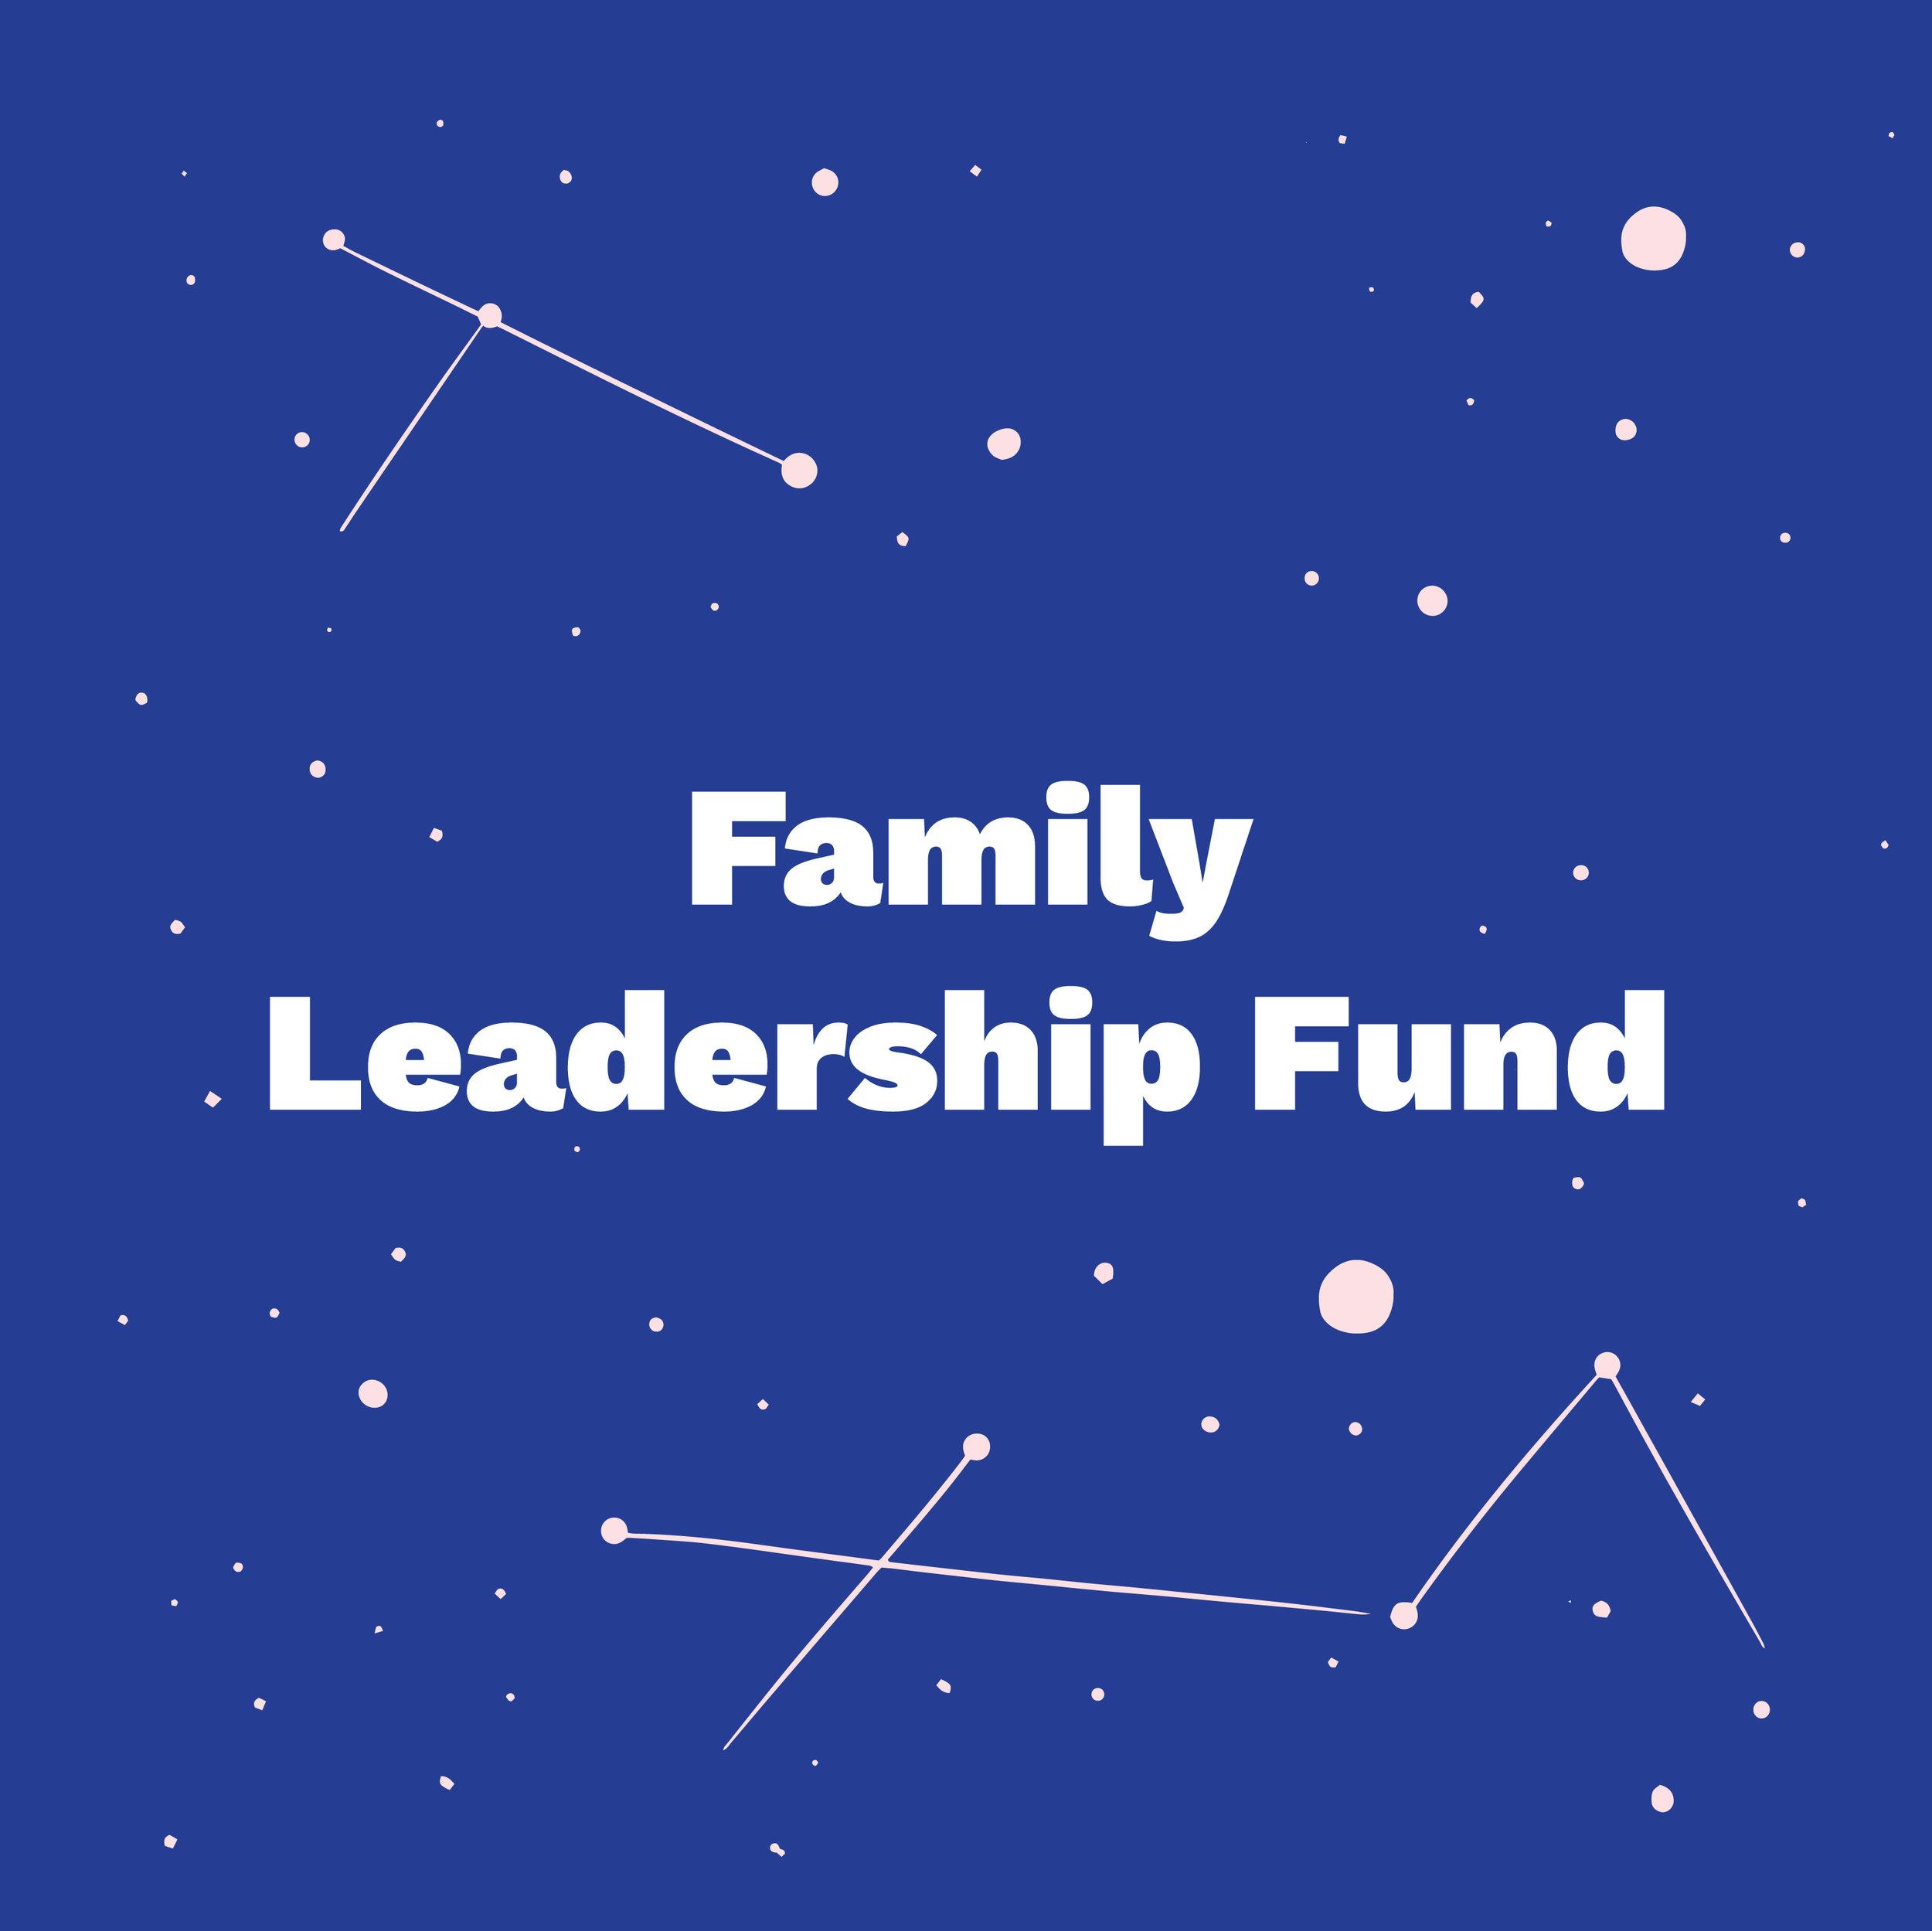 Family Leadership Fund